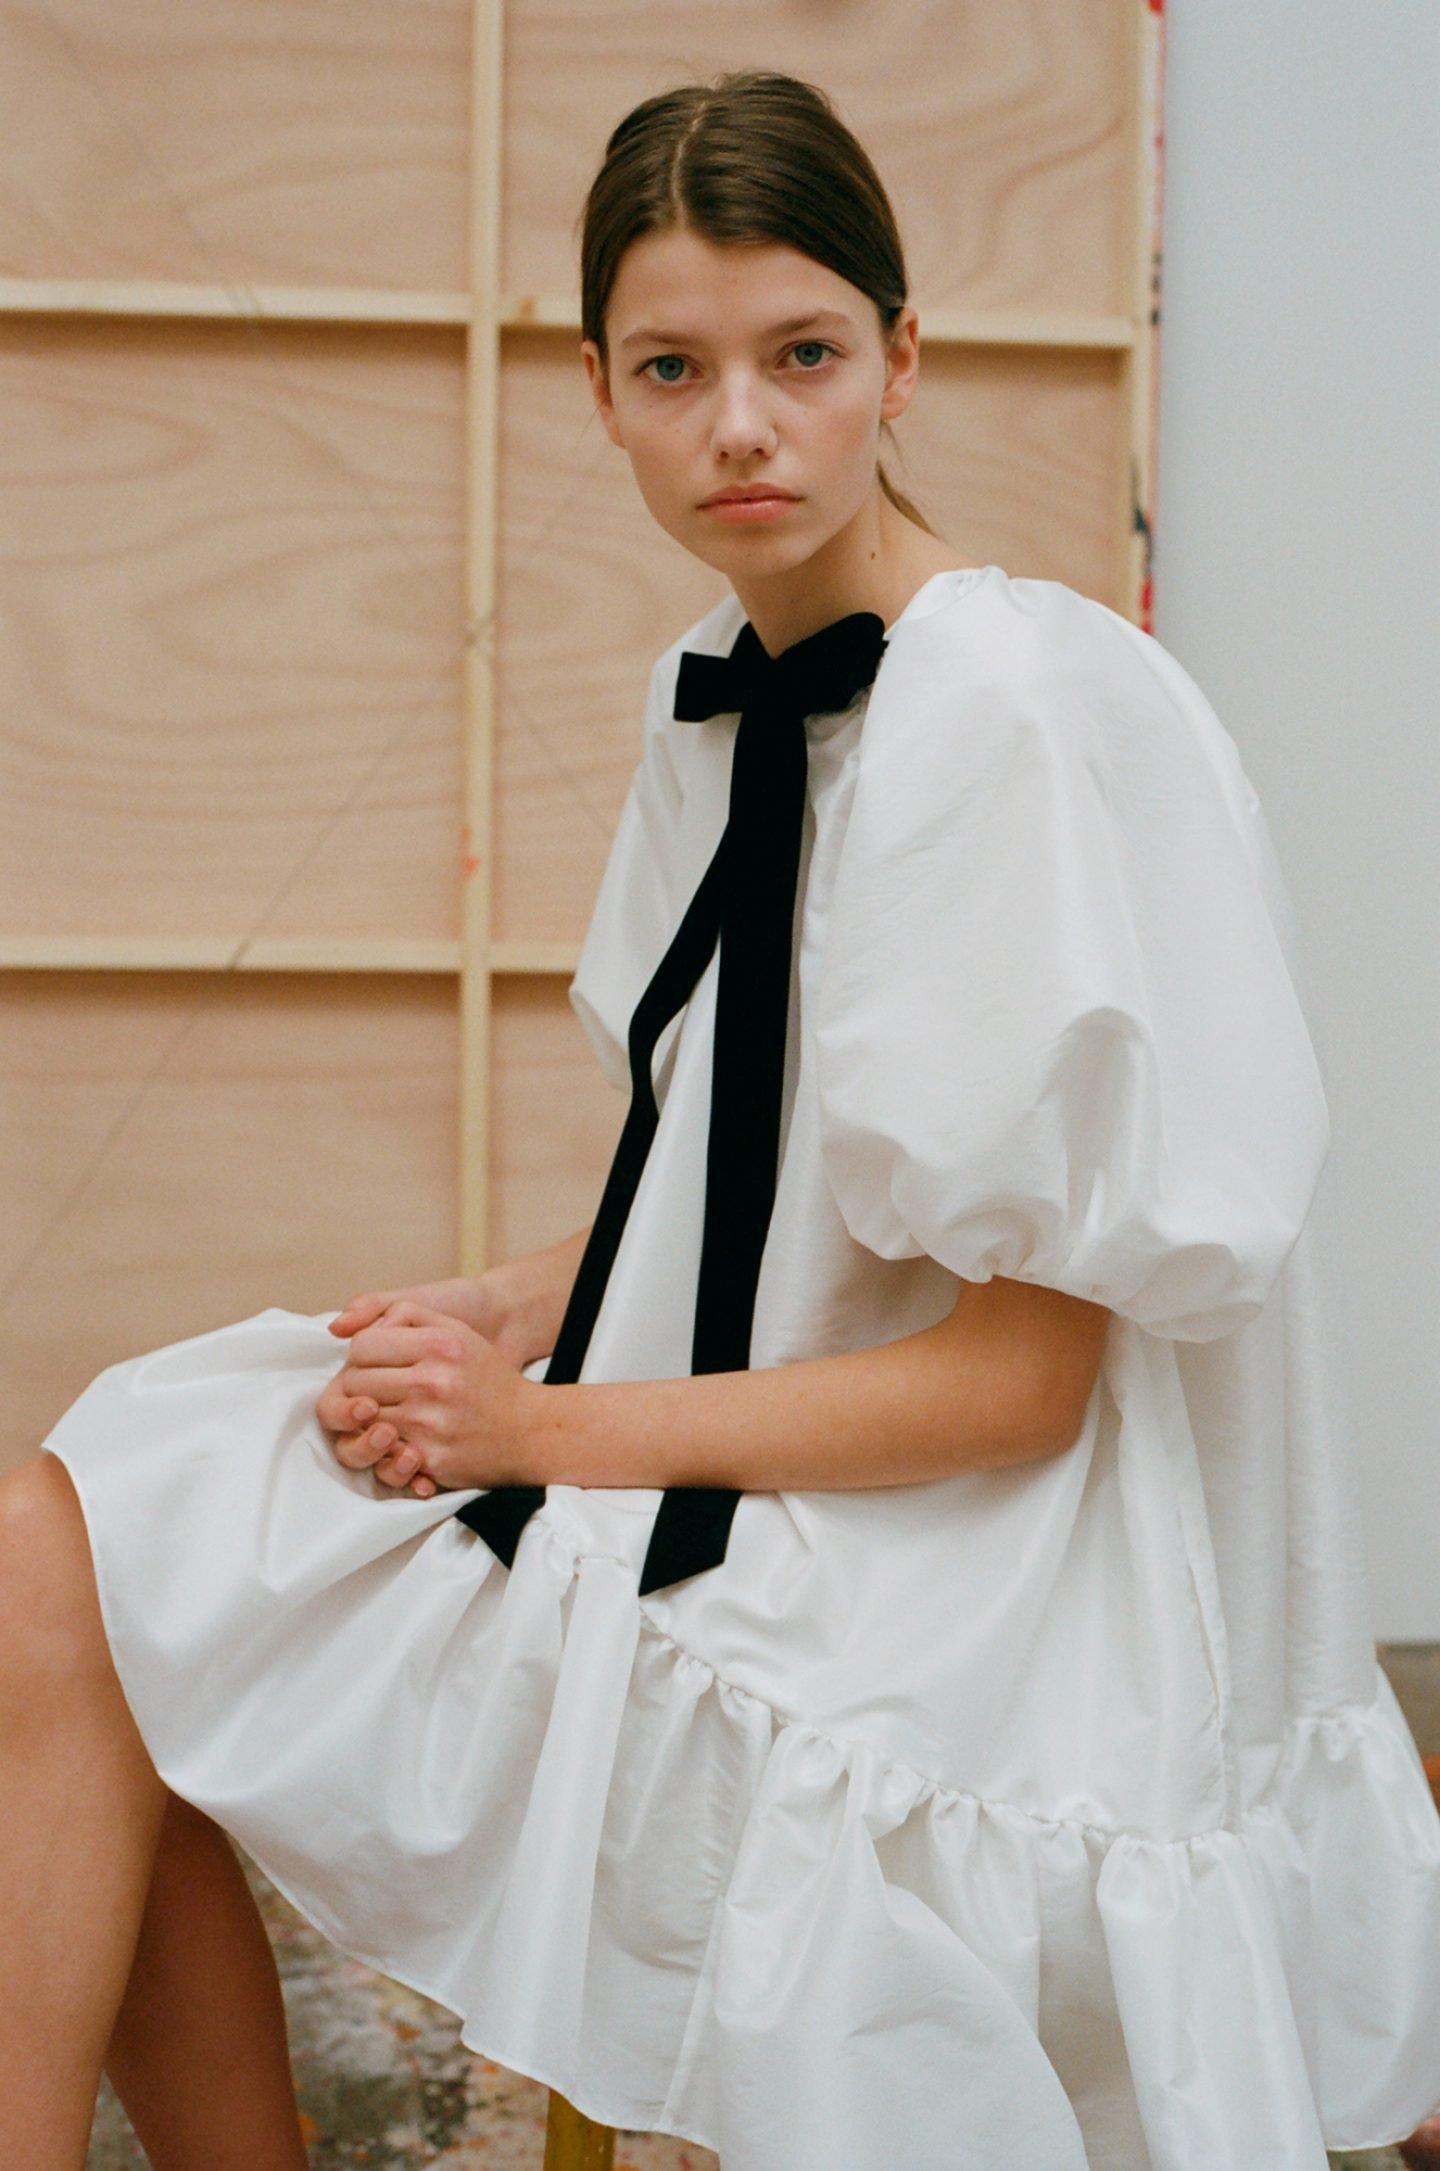 iGNANT-Design-Cecilie-Bahnsen-006